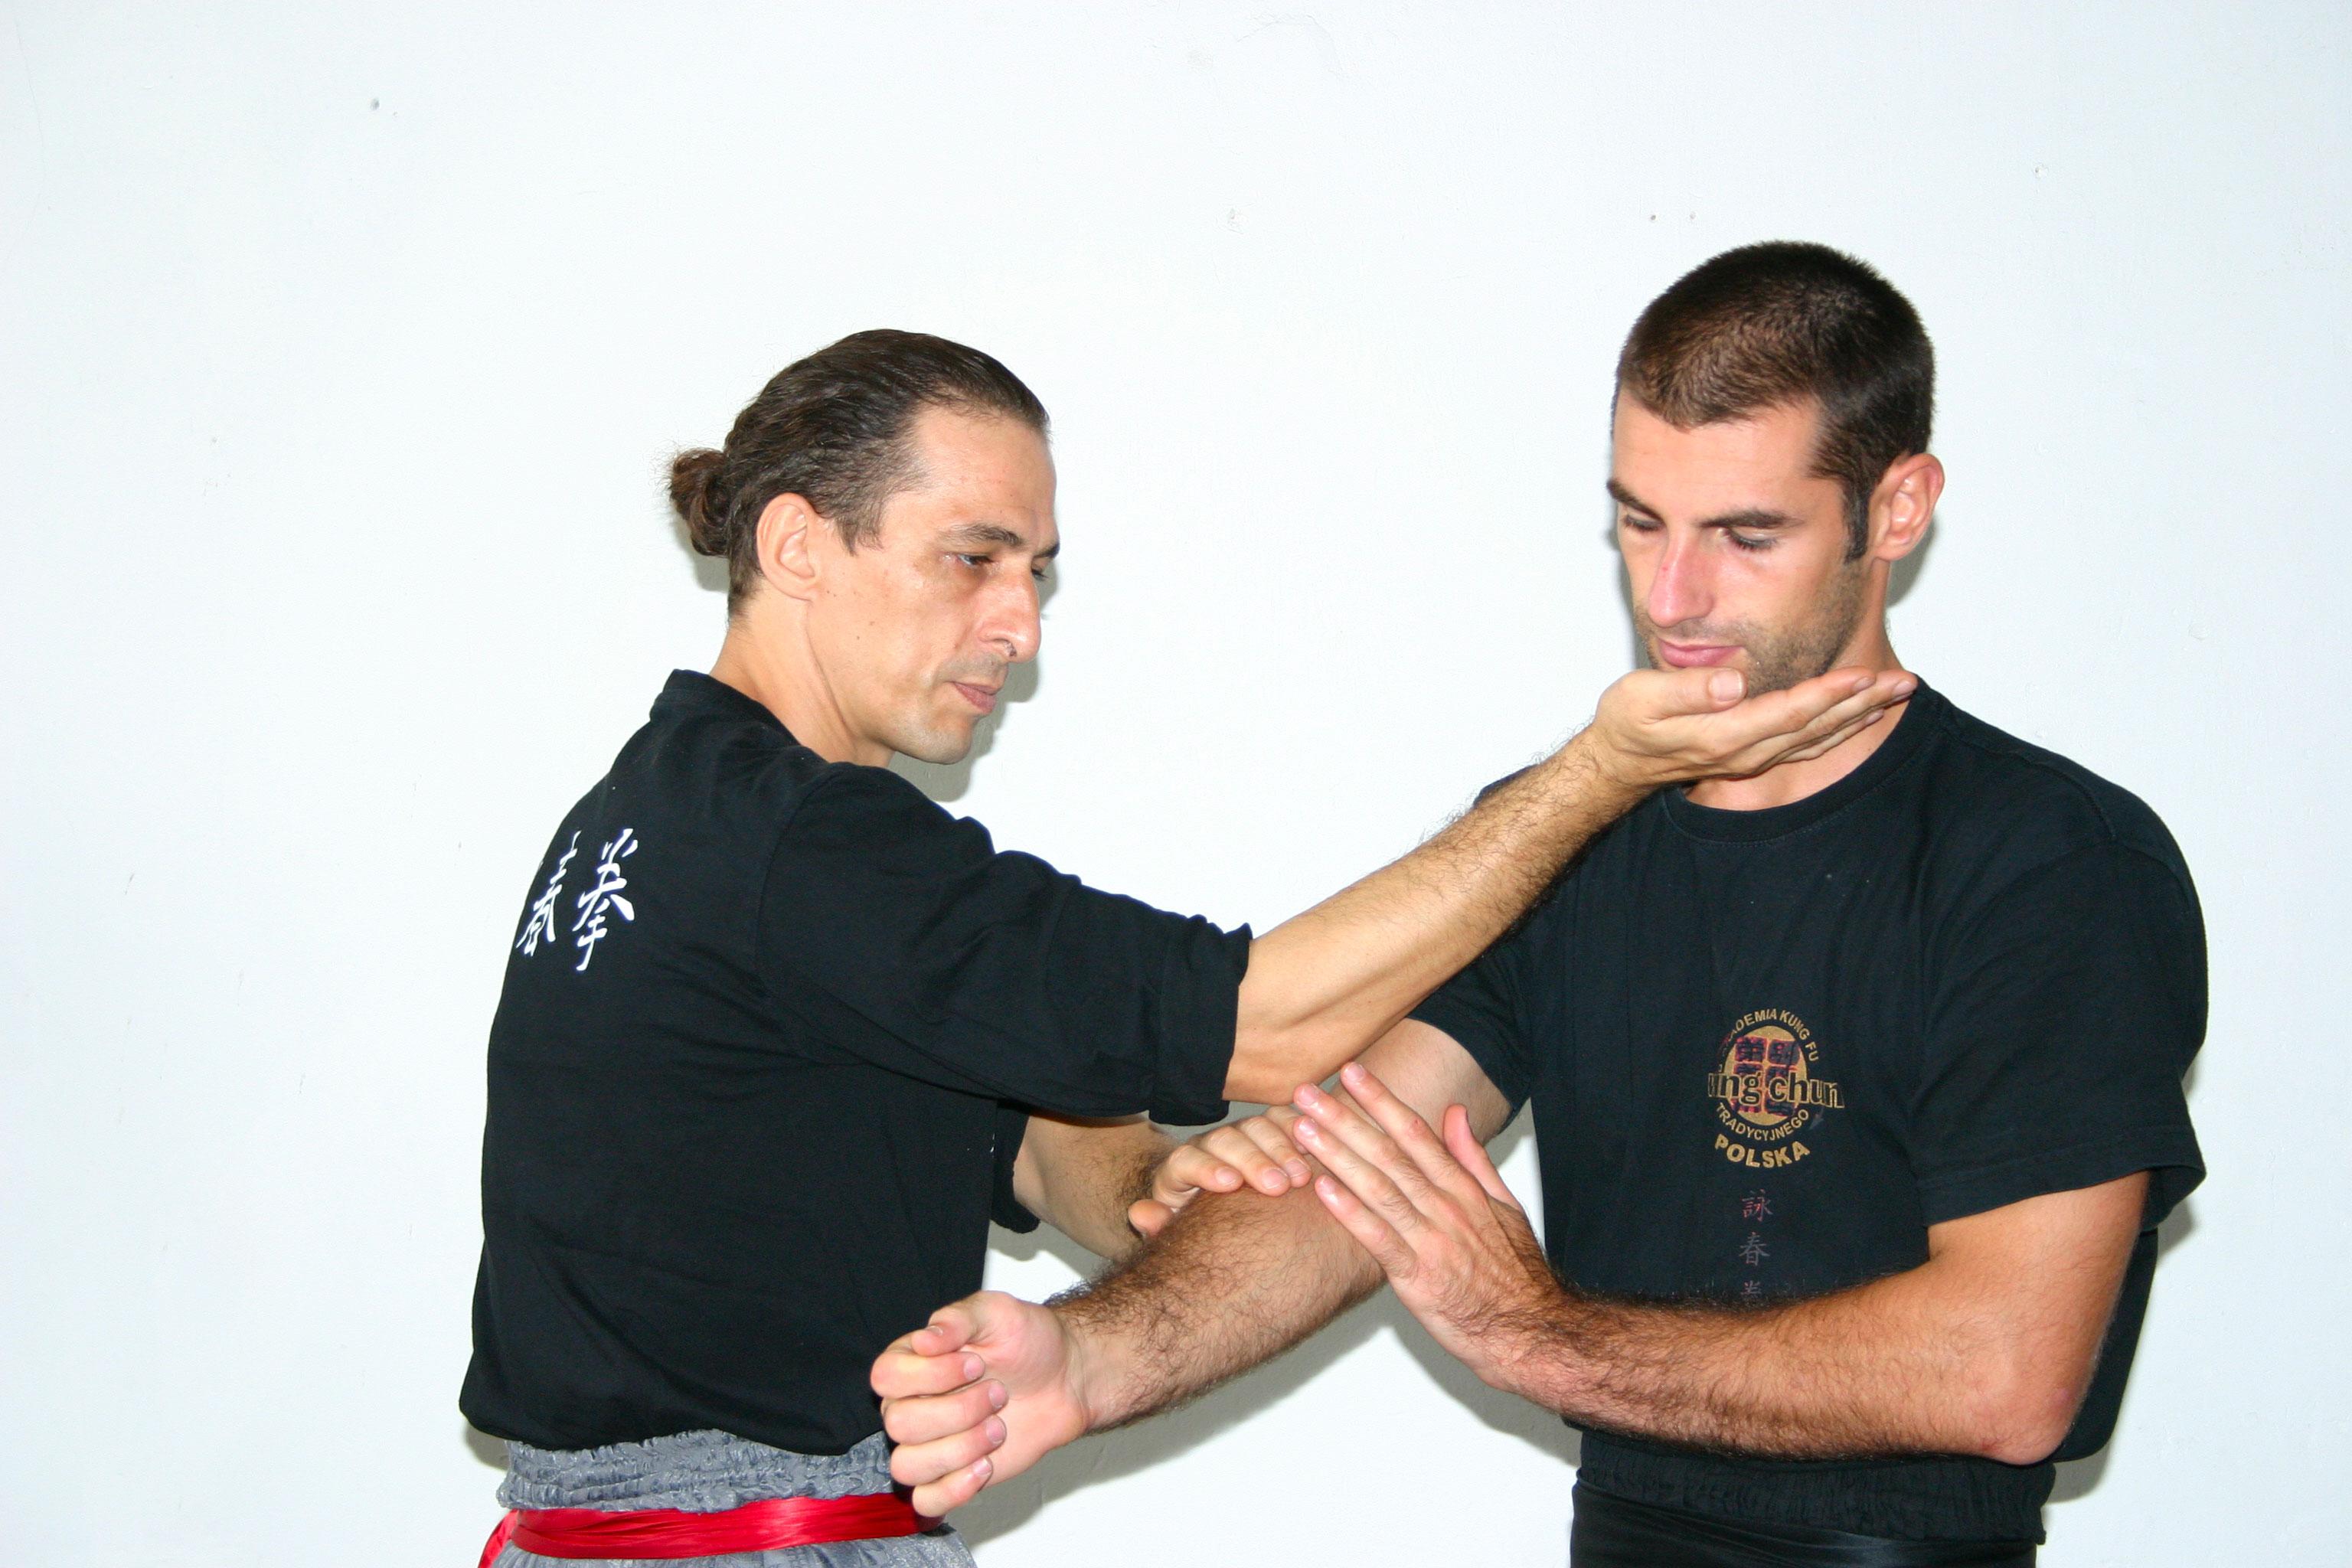 Didier Beddar & Adrien Jeunemaitre